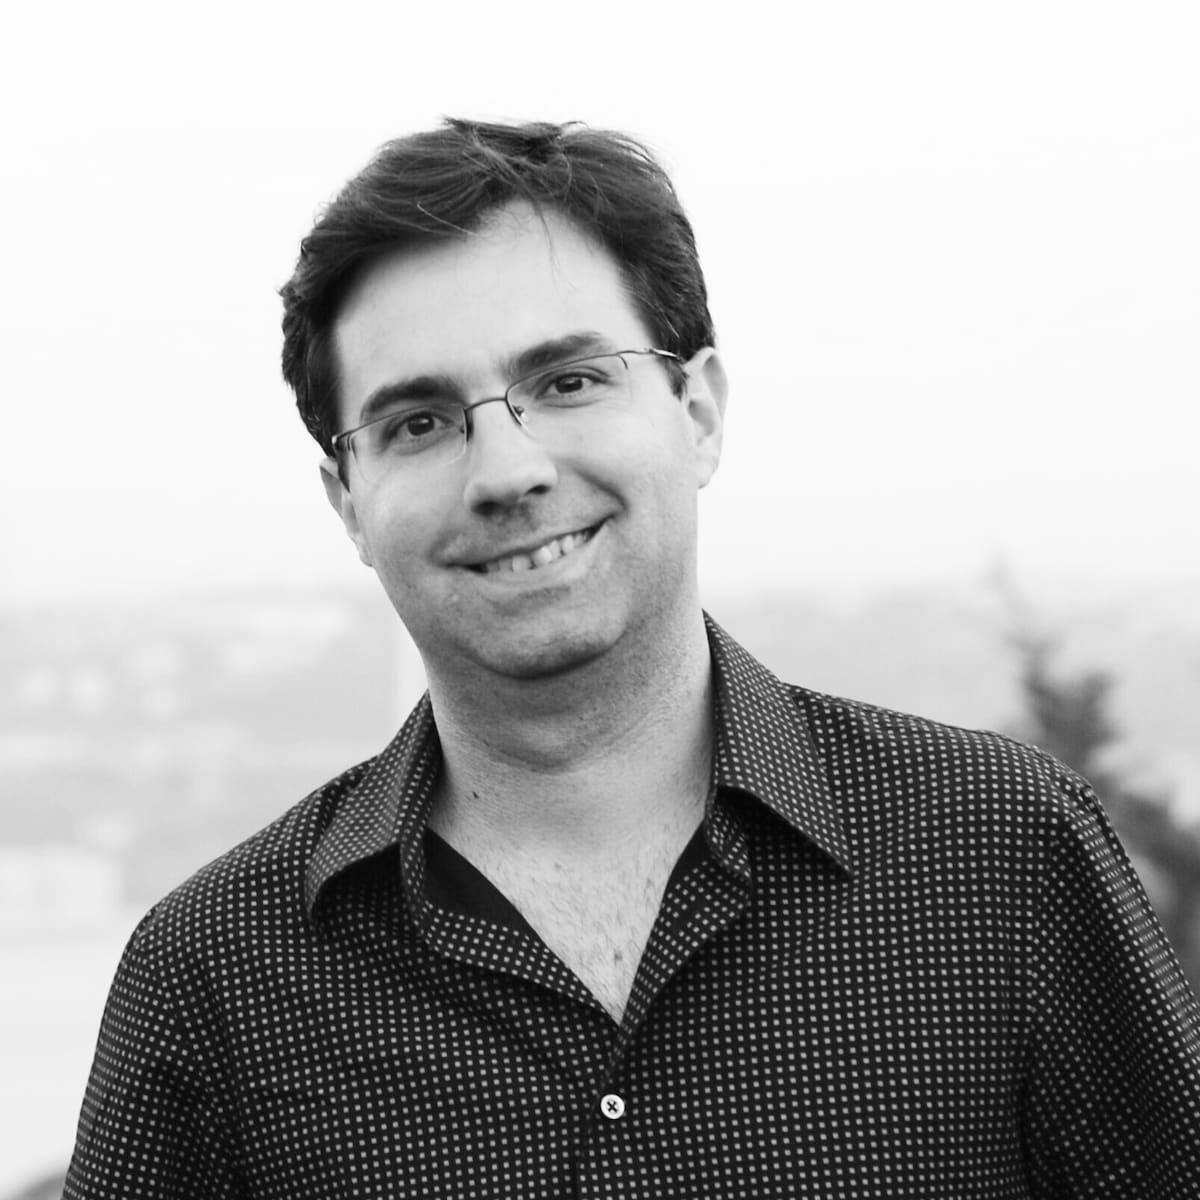 Eric From Lauro de Freitas, Brazil